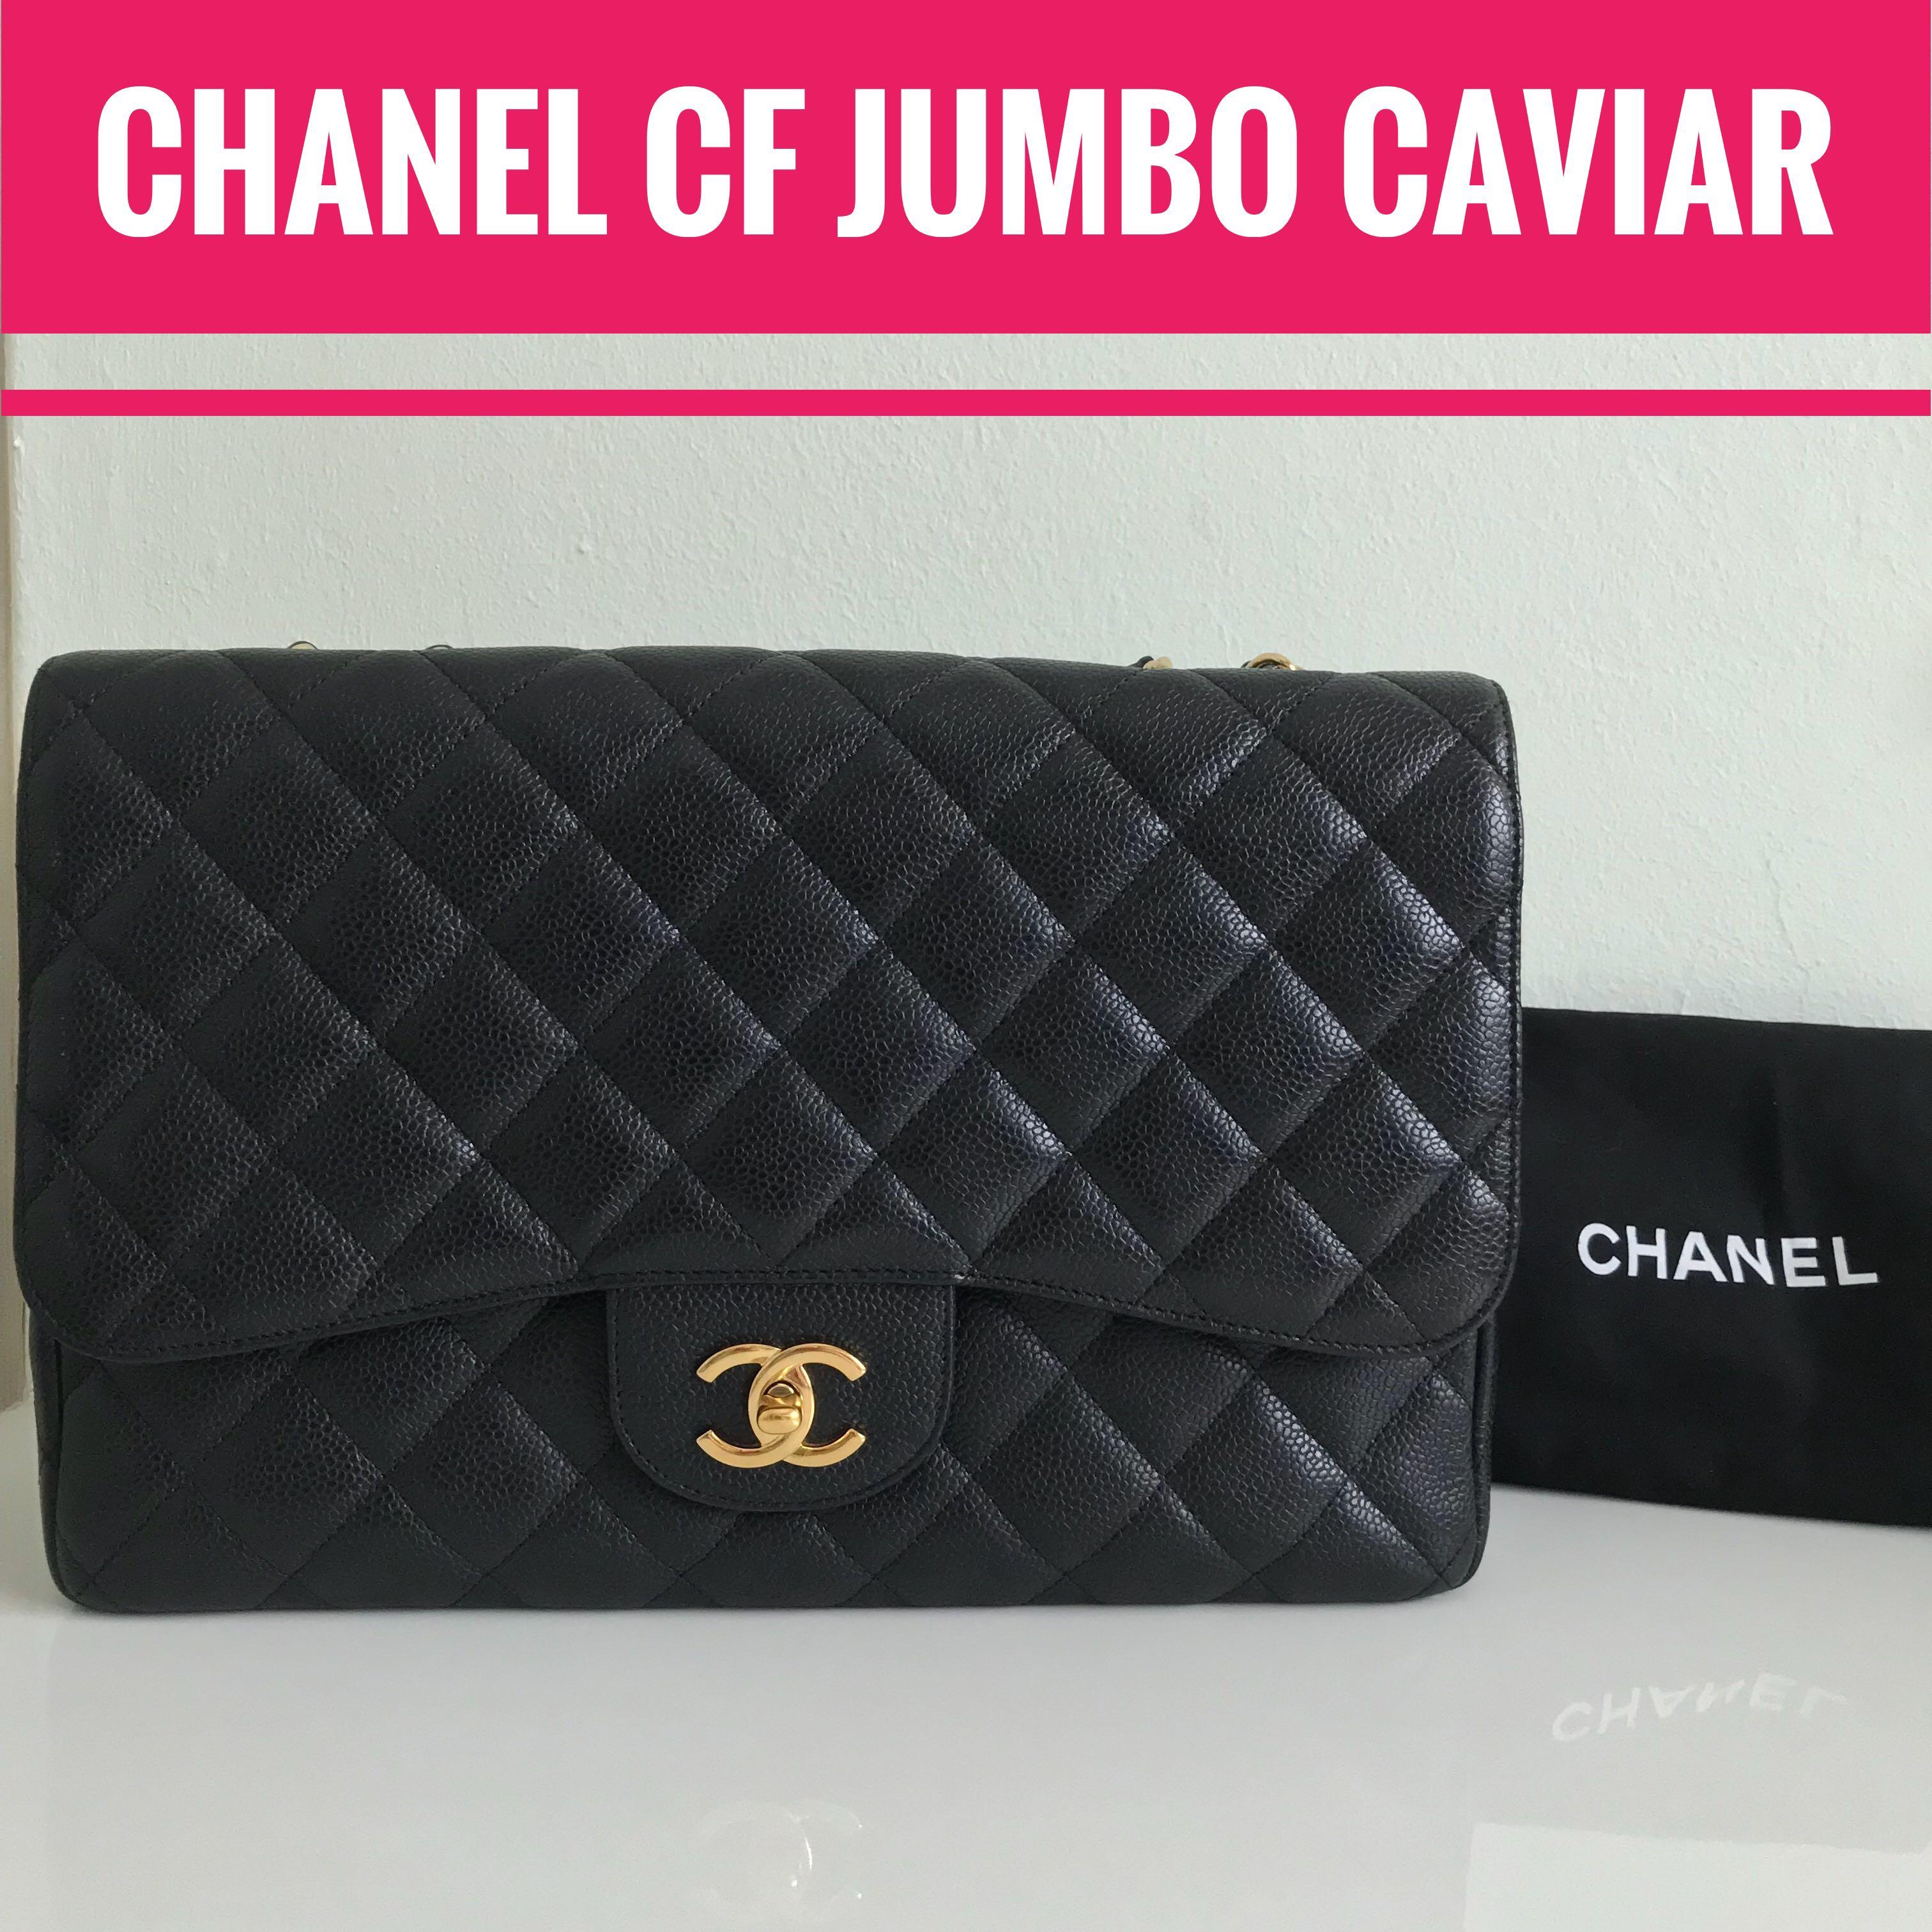 8f28ff405ccd2d CHANEL CF Jumbo (30cm) Caviar with GHW, Single Flap, Luxury, Bags ...